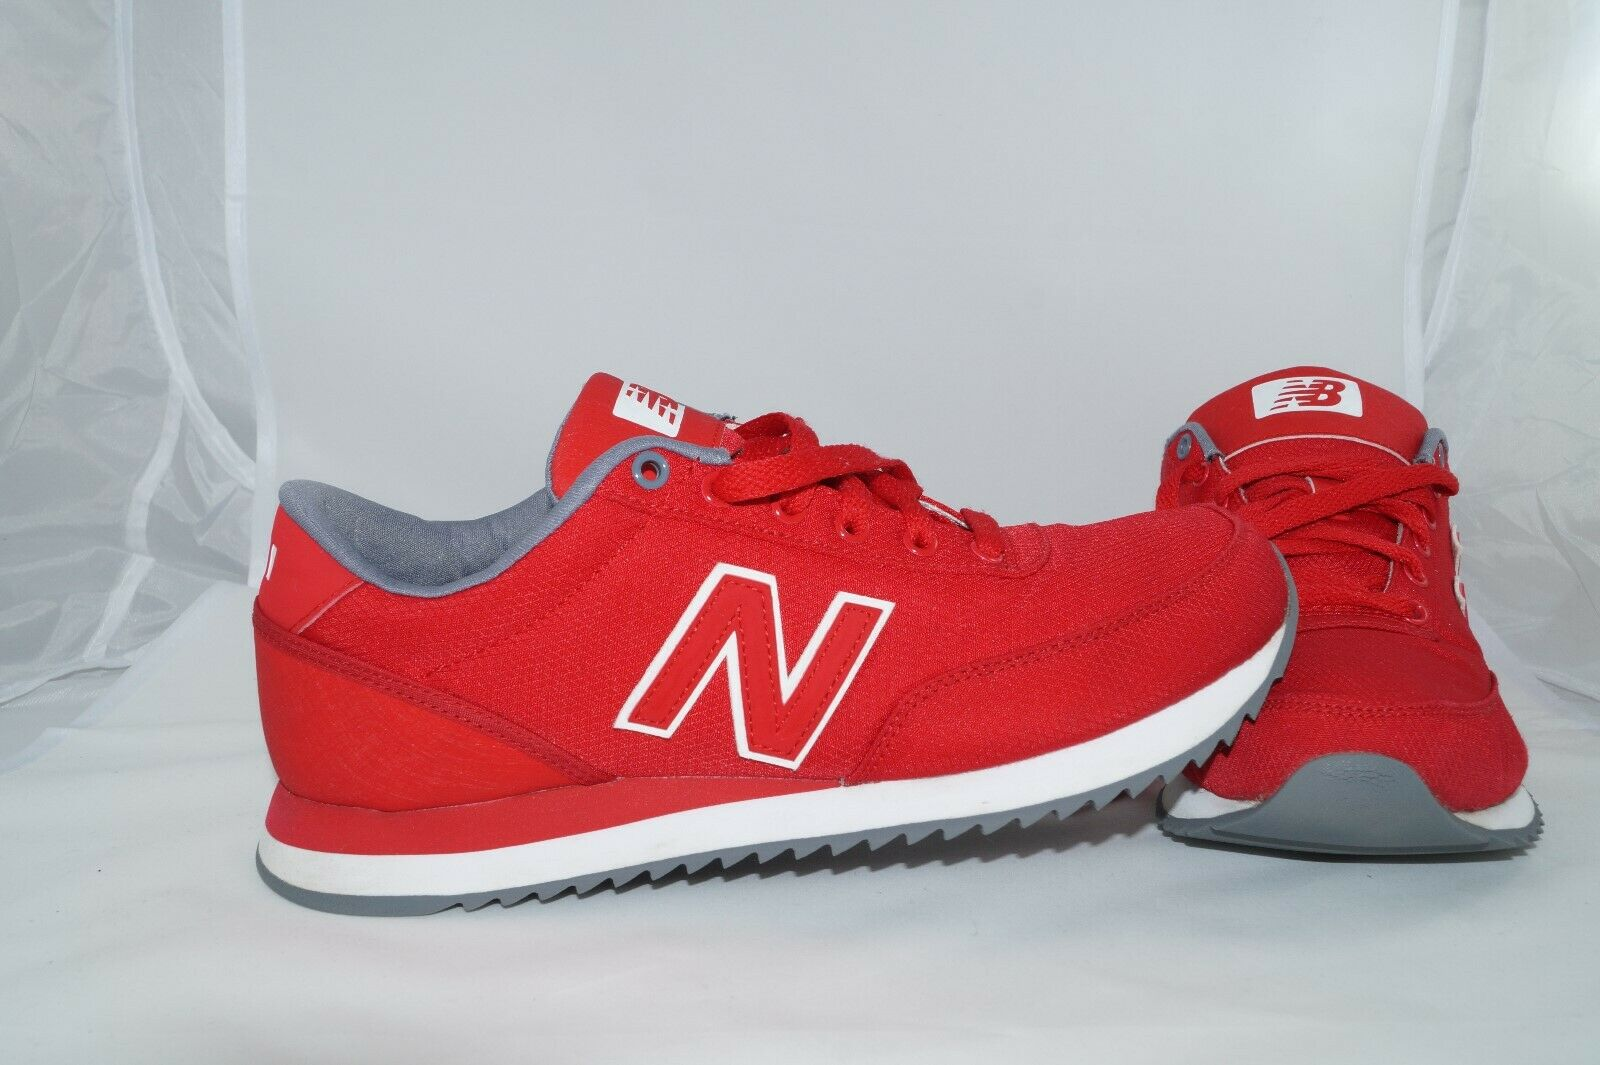 New balance 501 UE 41,5 us 8 UK 7,5 rojo mz501drc zapatillas deportivas